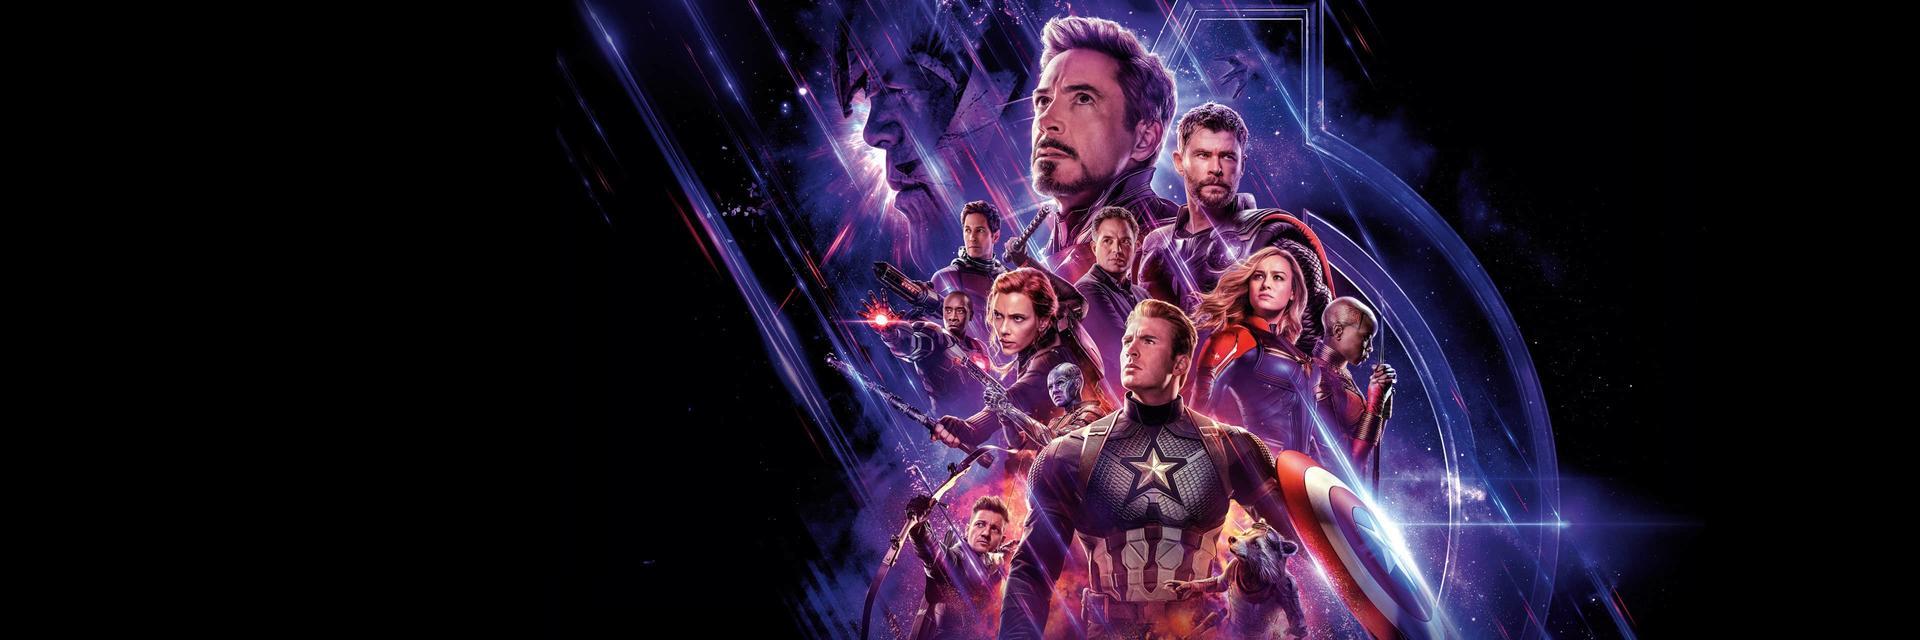 Avengers: end game - mortal tech